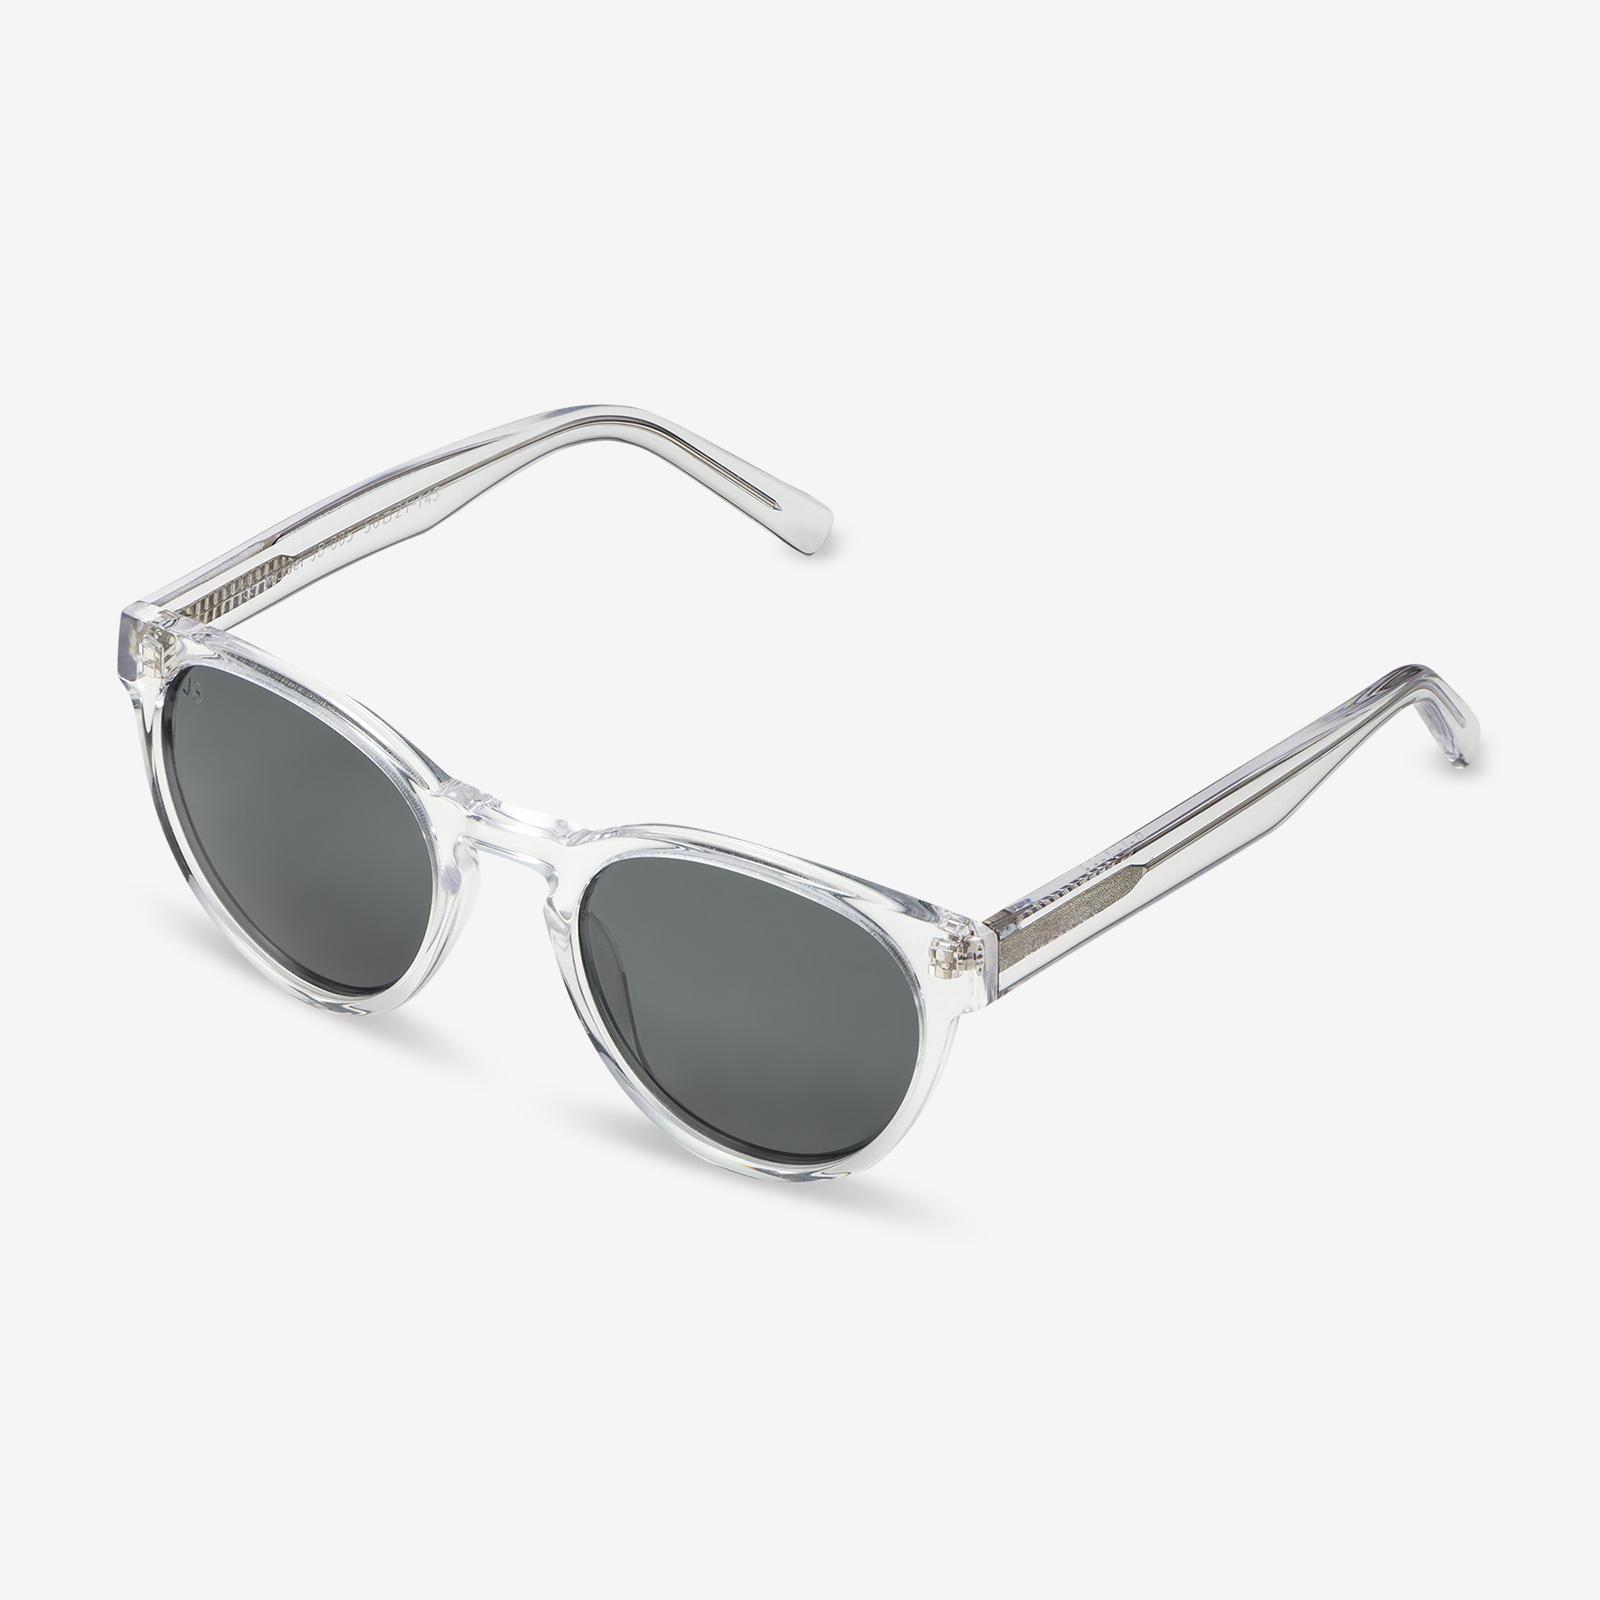 sunglasses product photo, sunglass product photo, frame product photo